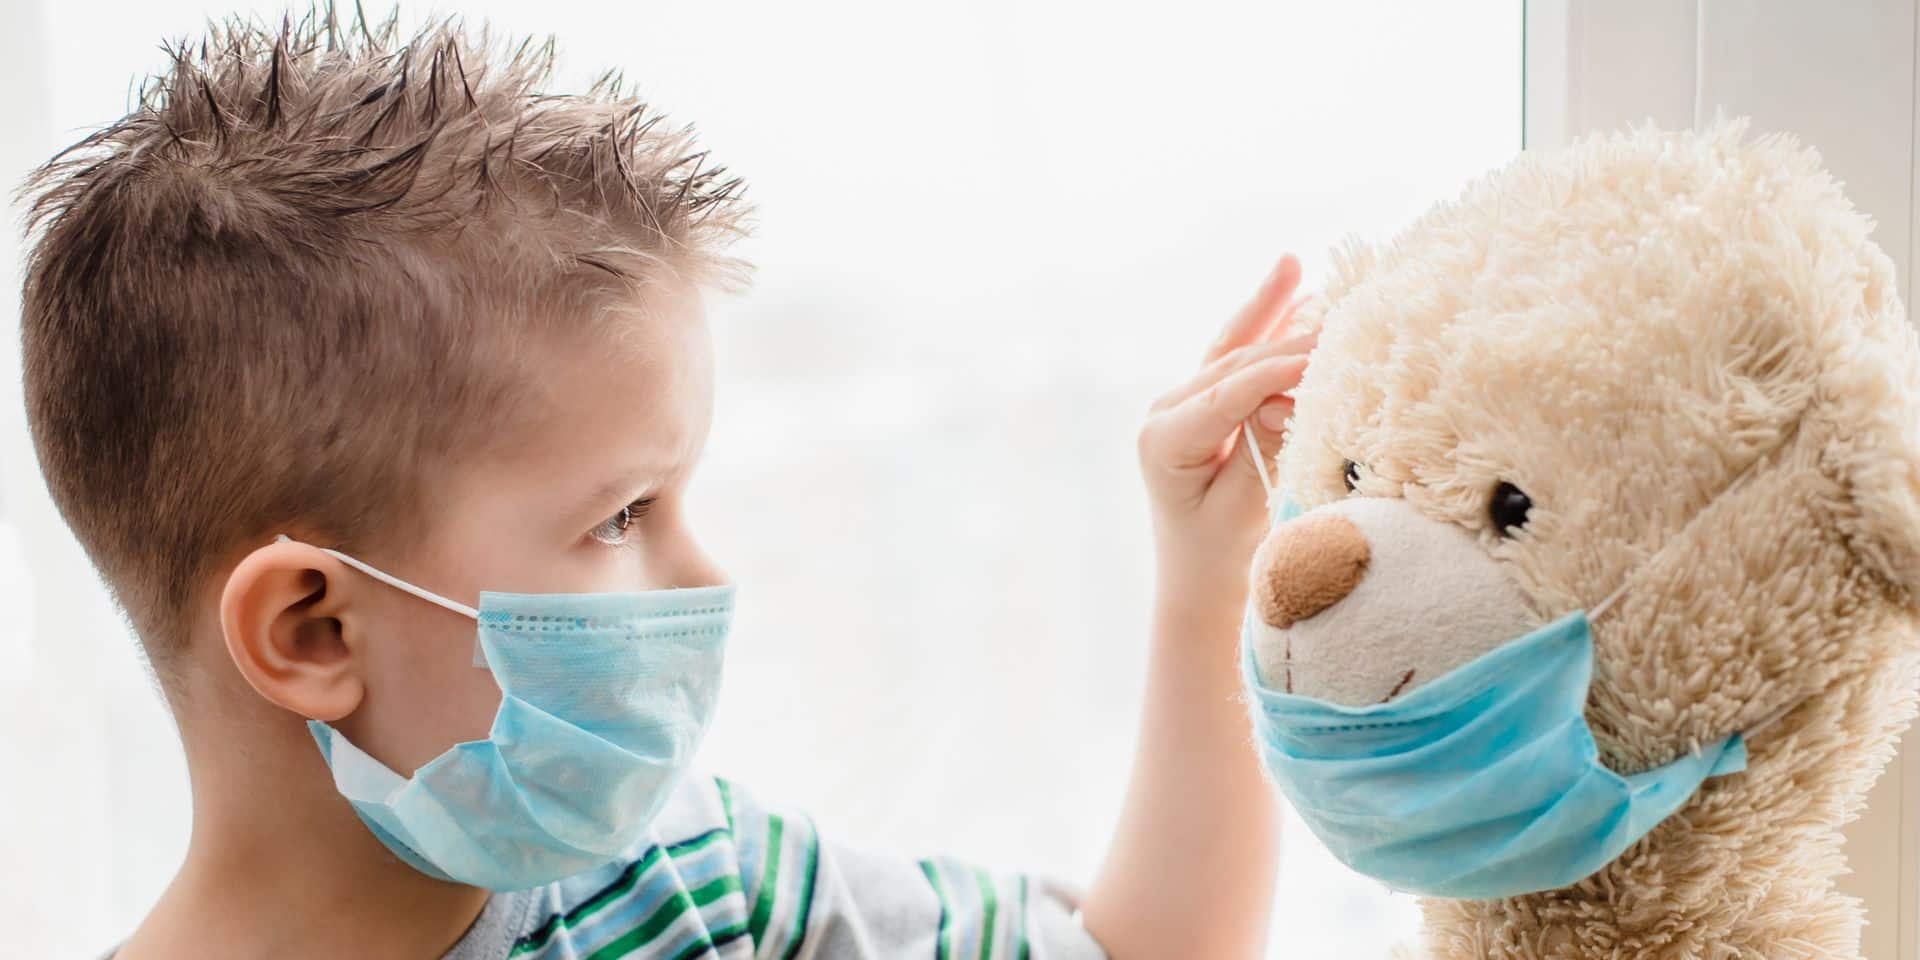 A,Small,Child,Helps,A,Teddy,Bear,Put,On,A